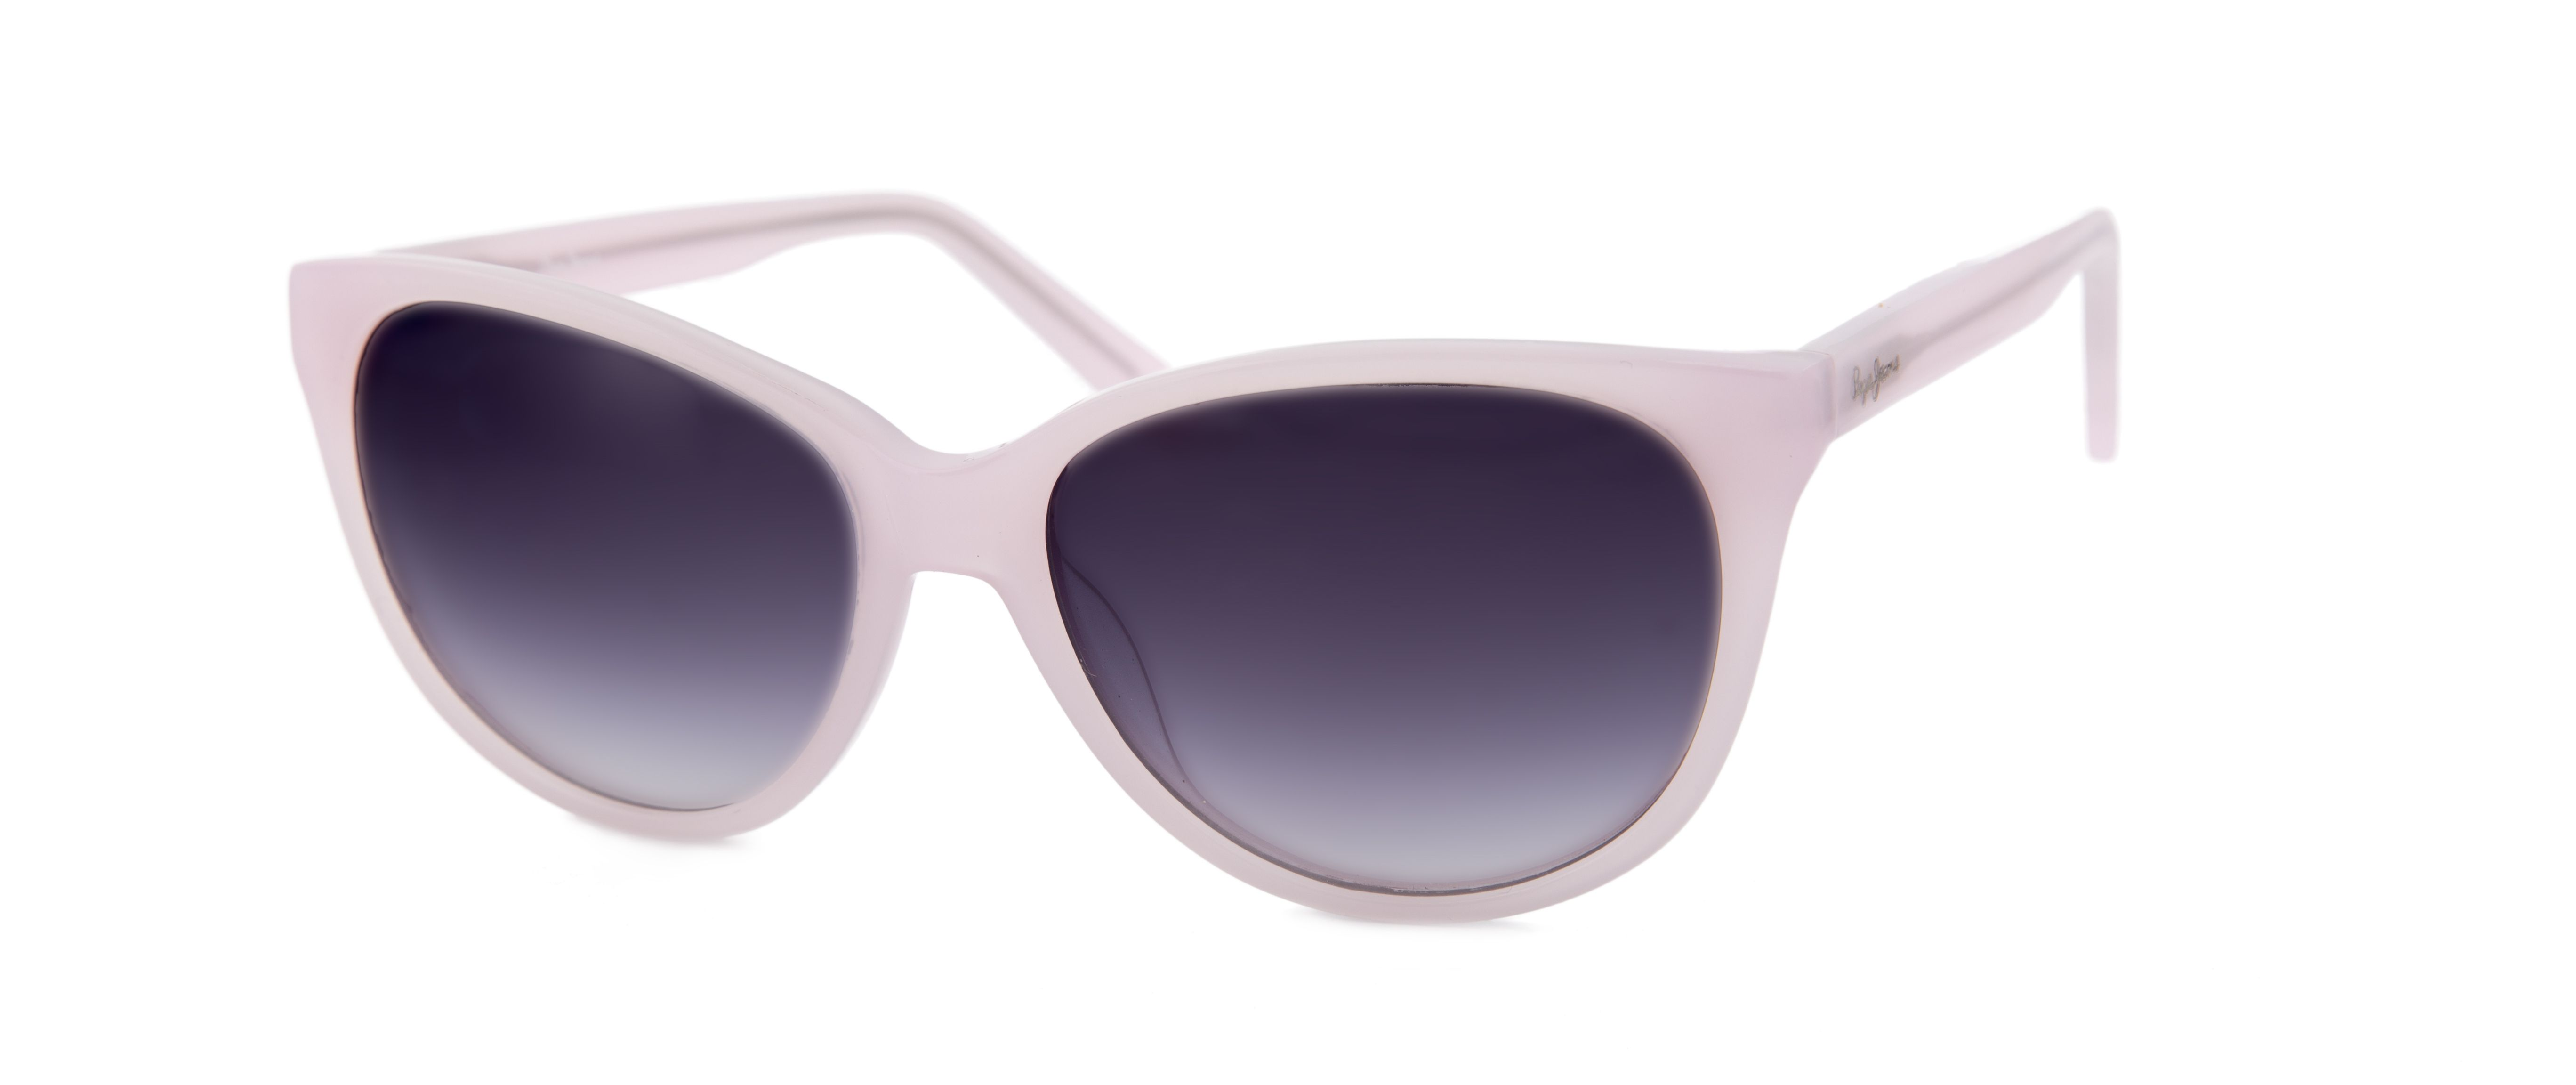 6dfaf4d797 gafas sol ray de opticalia ban RZzgRq